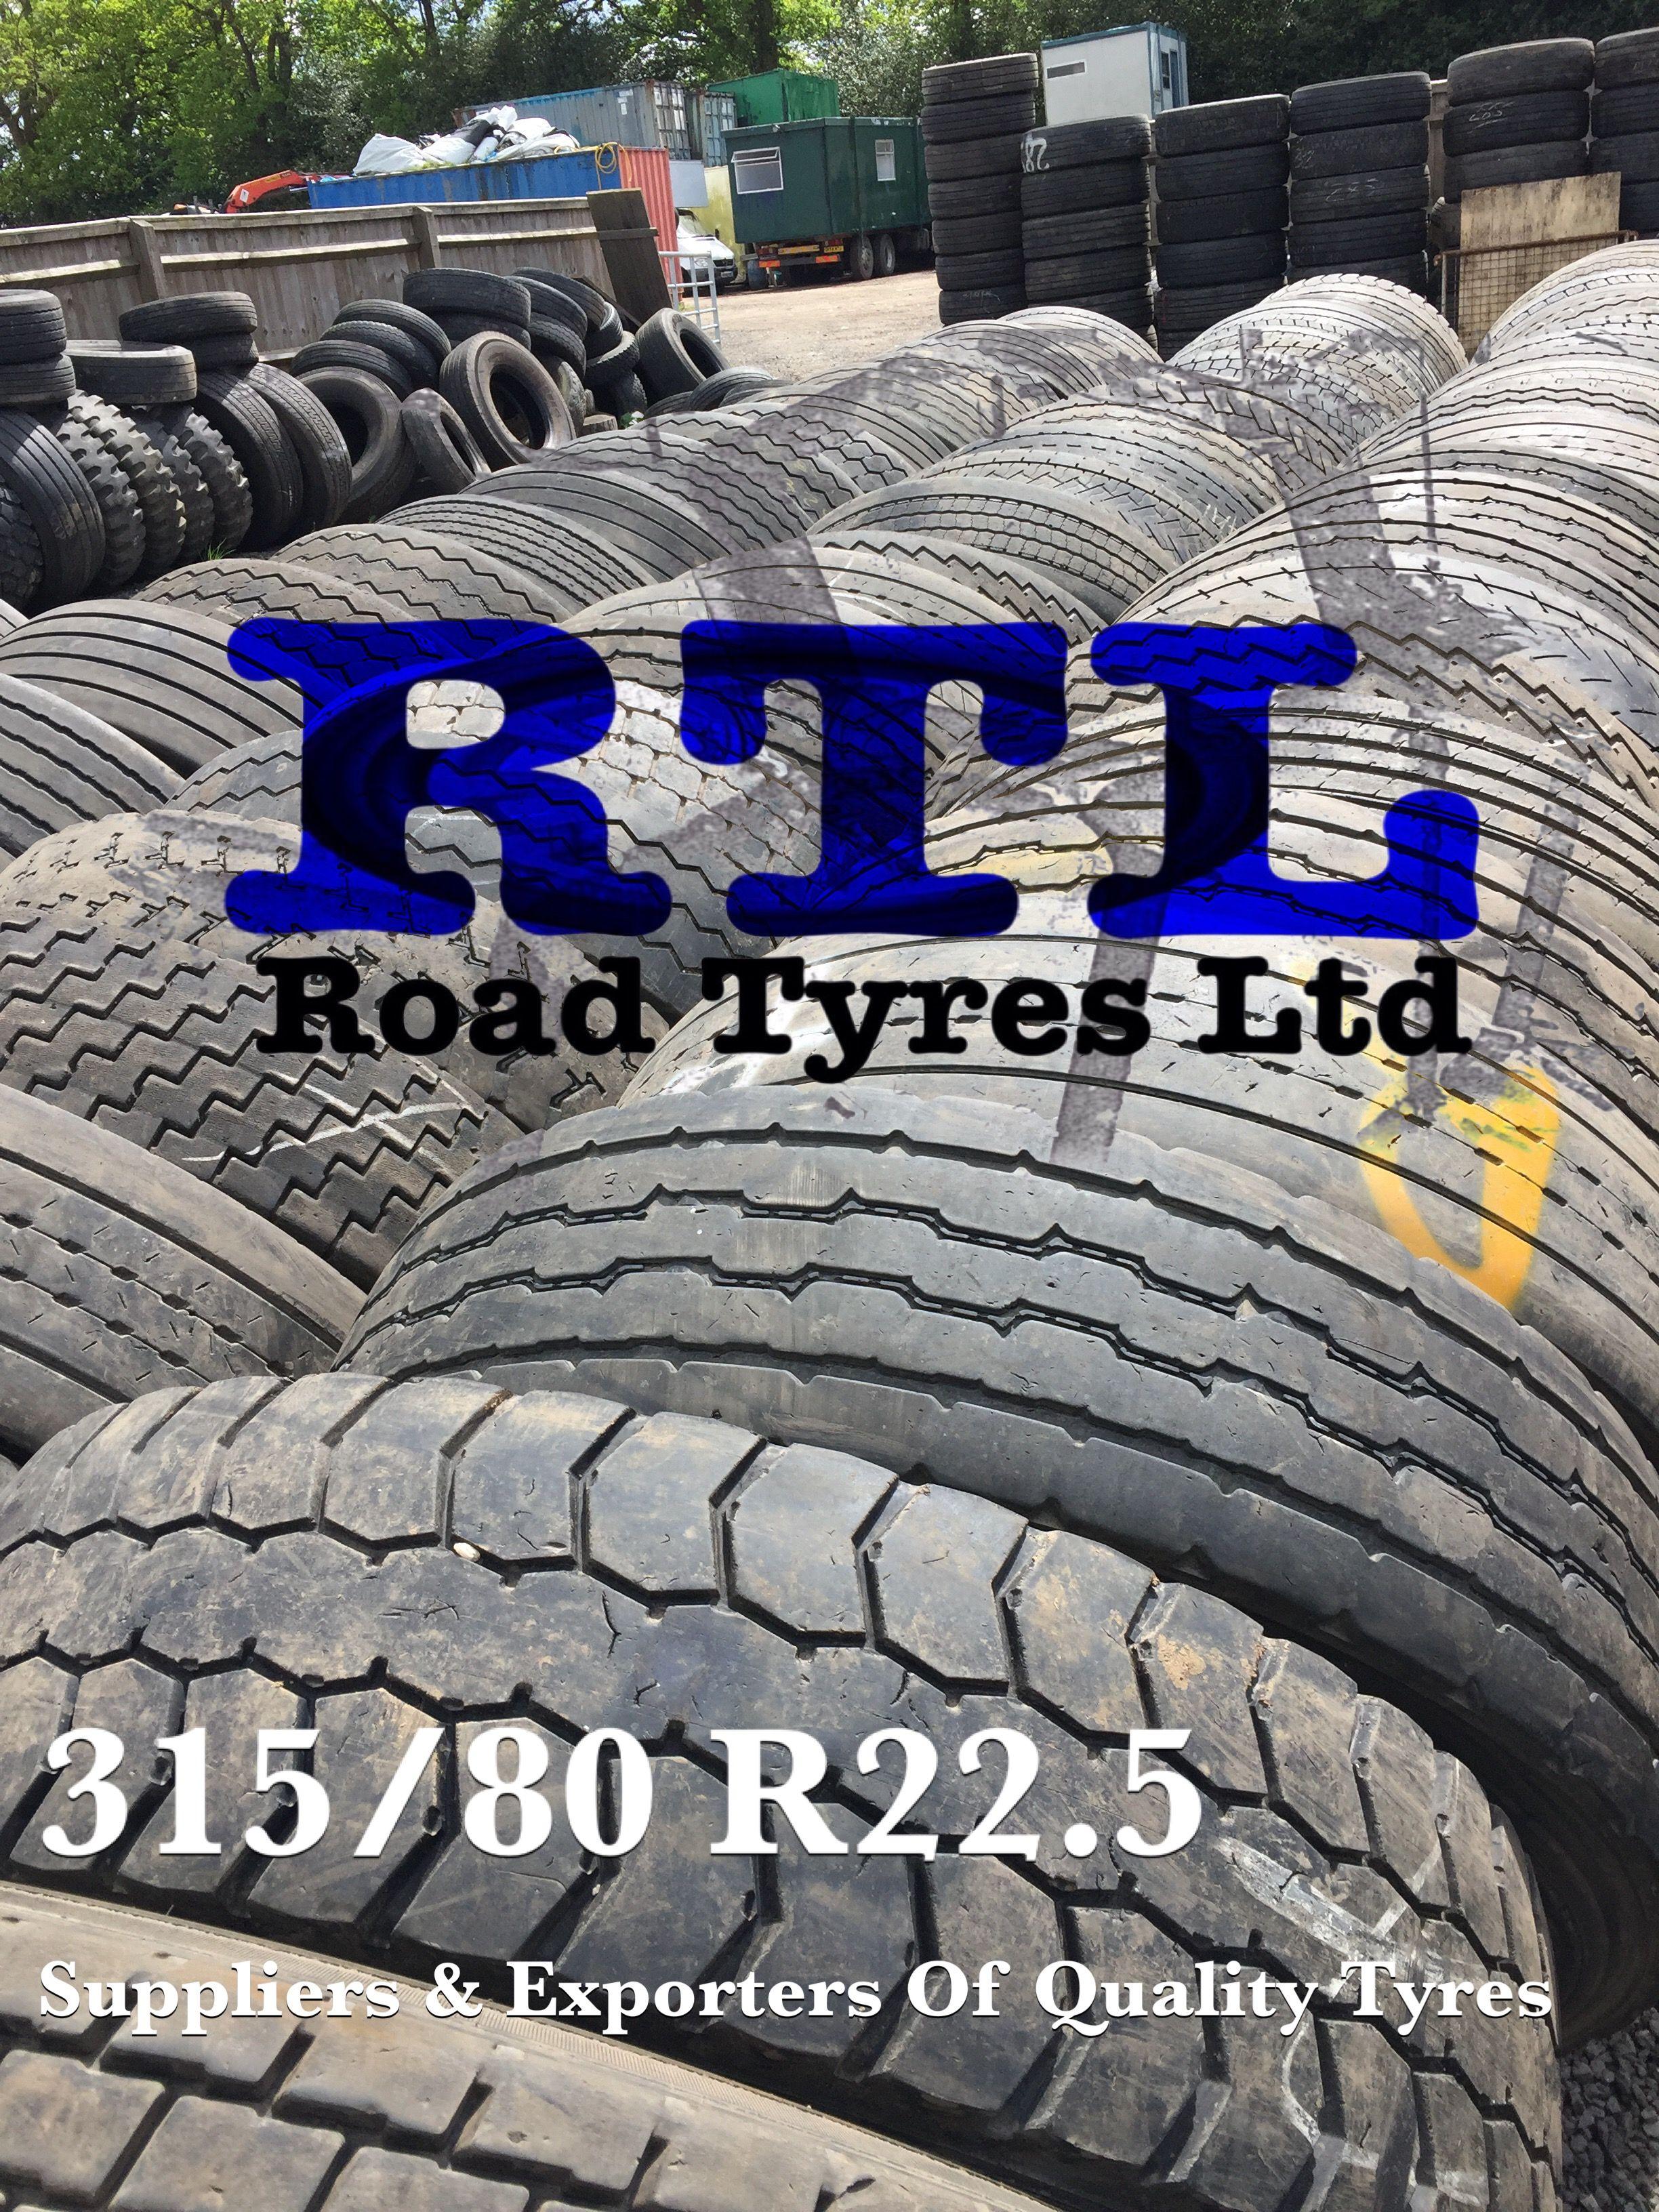 South Road Tyres LTD